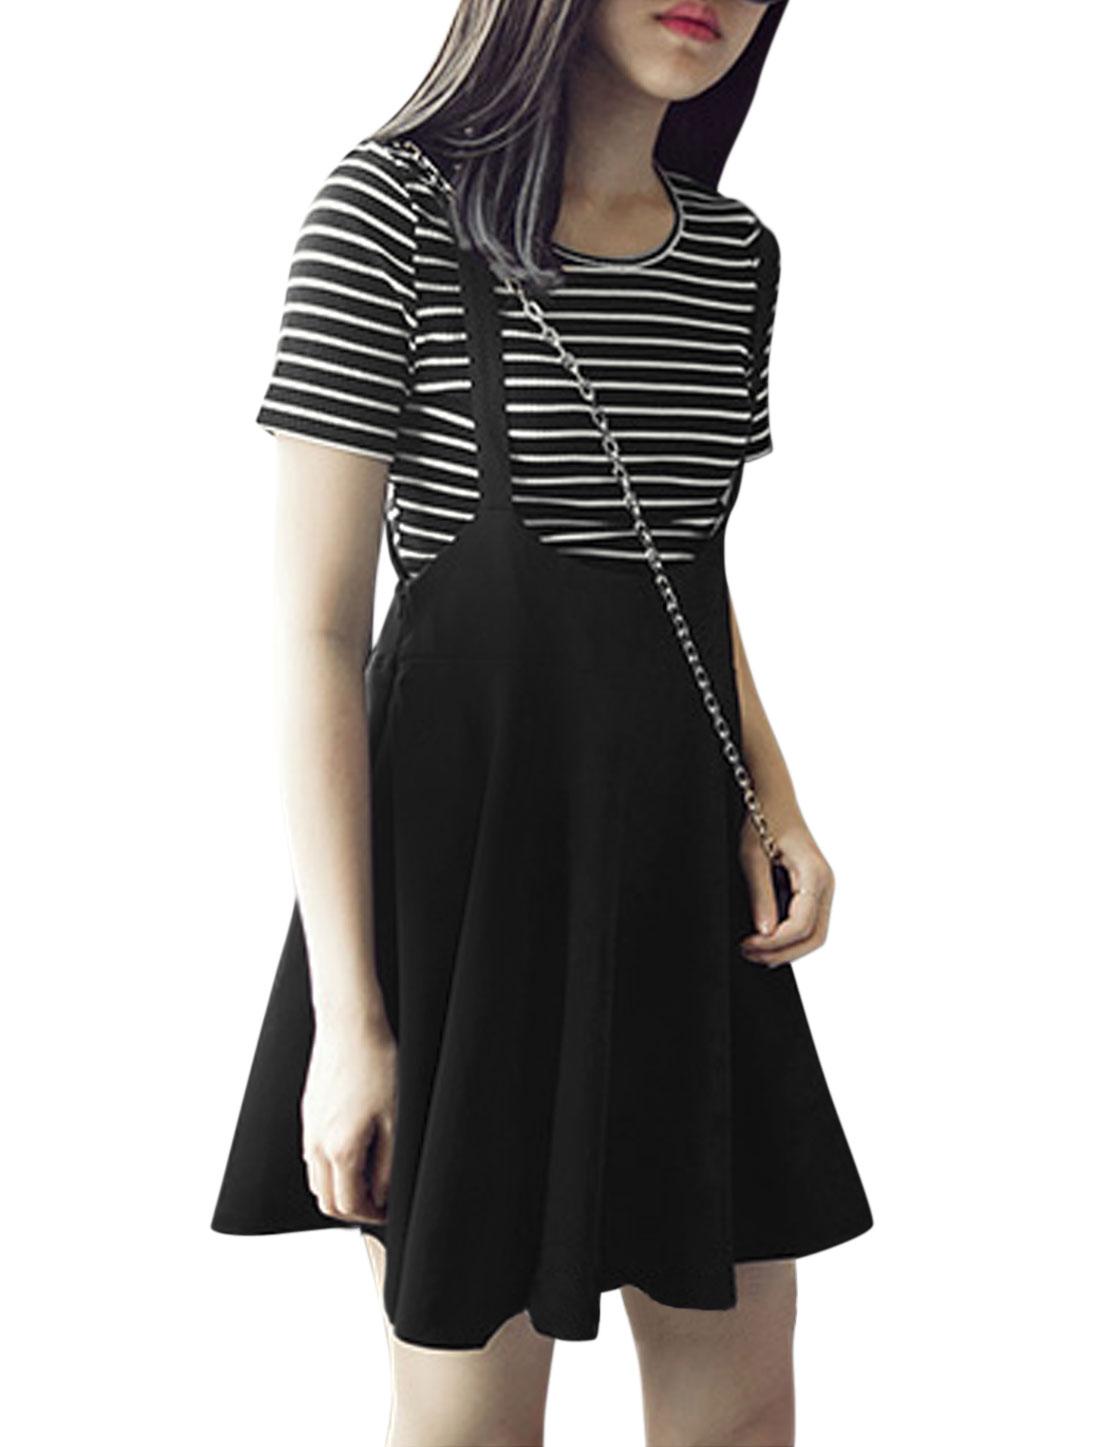 Women Round Neck Stripes T Shirts w Casual Suspender Skirt Set Black XS